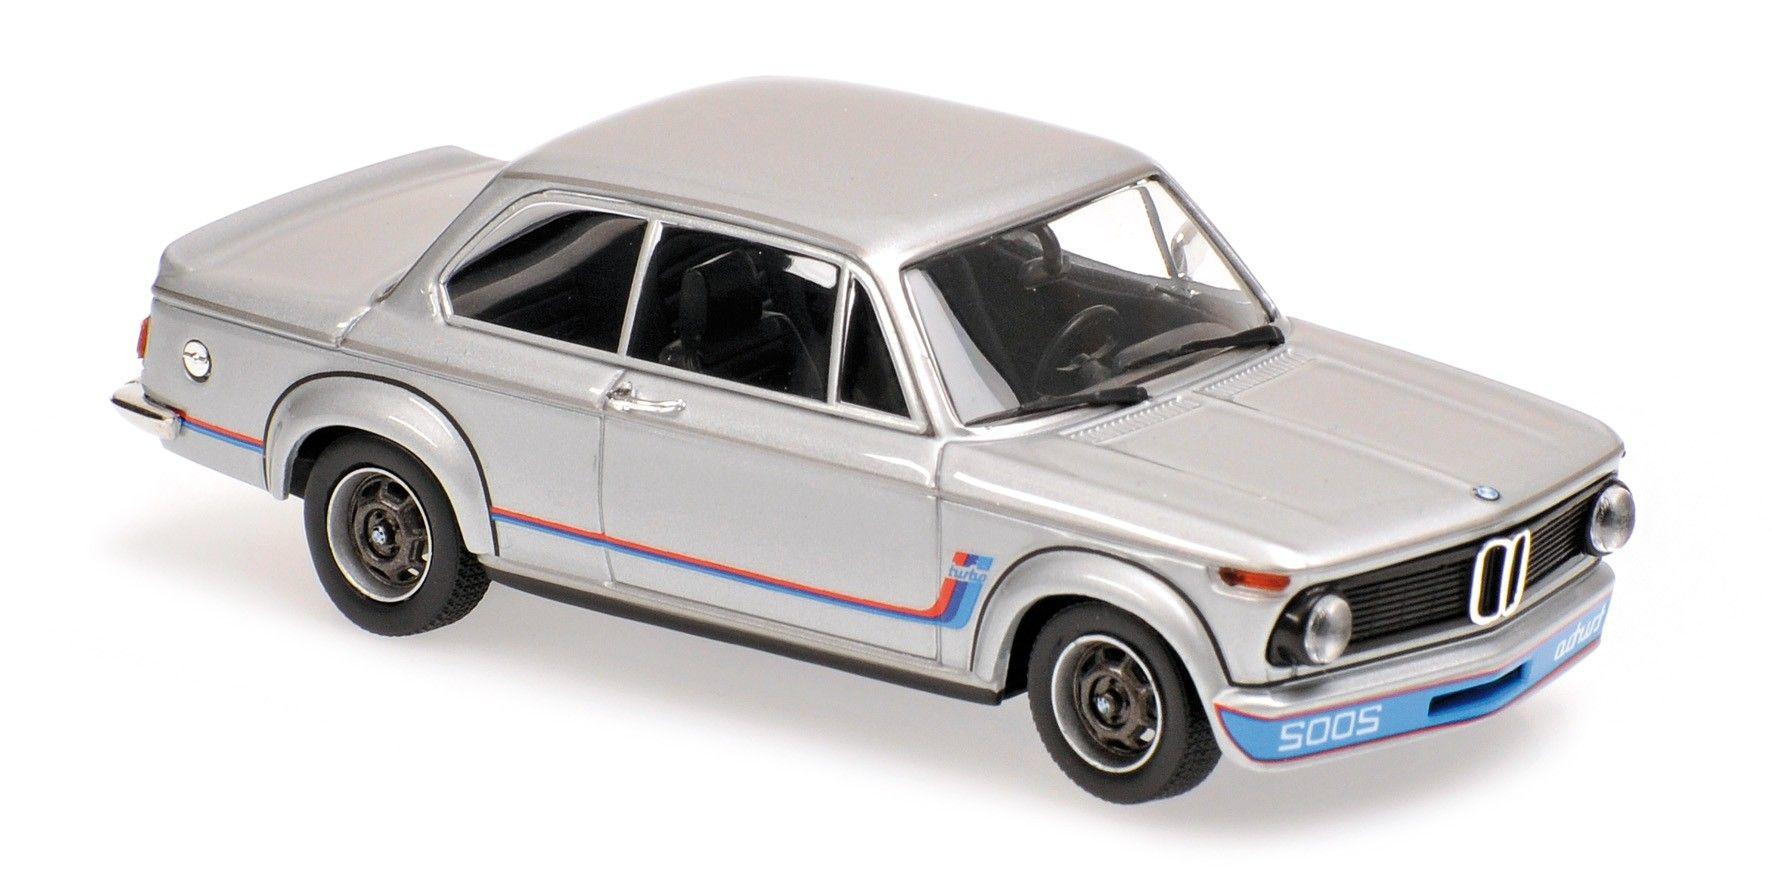 Bmw 2002 turbo 1973 silver maxichamps die cast hobbyland bmw 2002silvermodelsstreethtmlcars